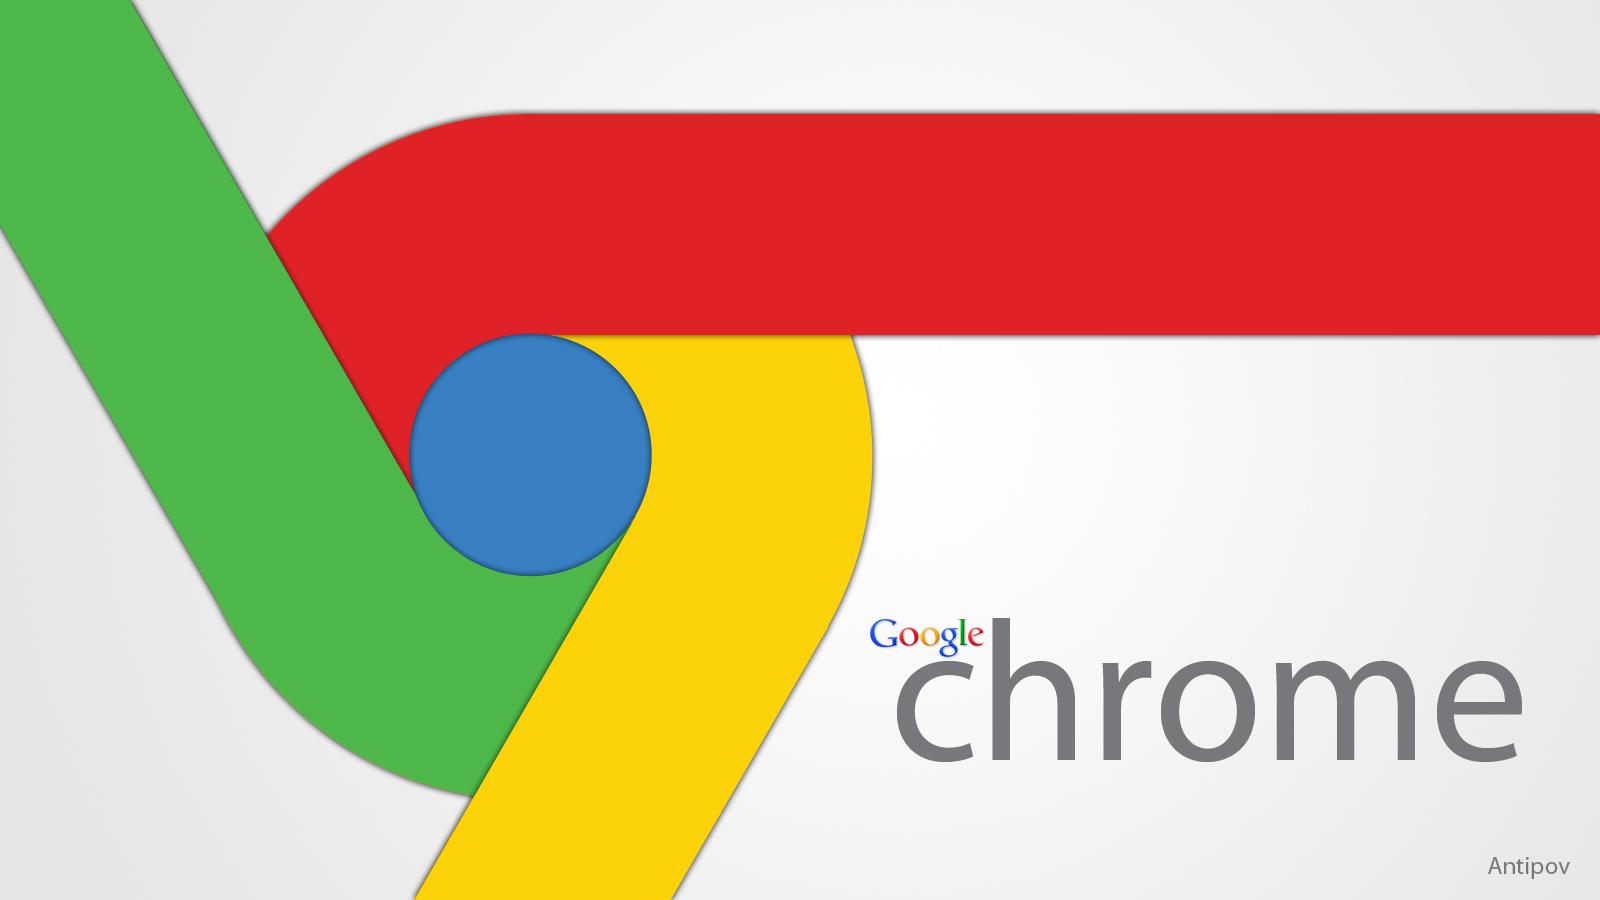 chrome indir türkçe, Chrome 51